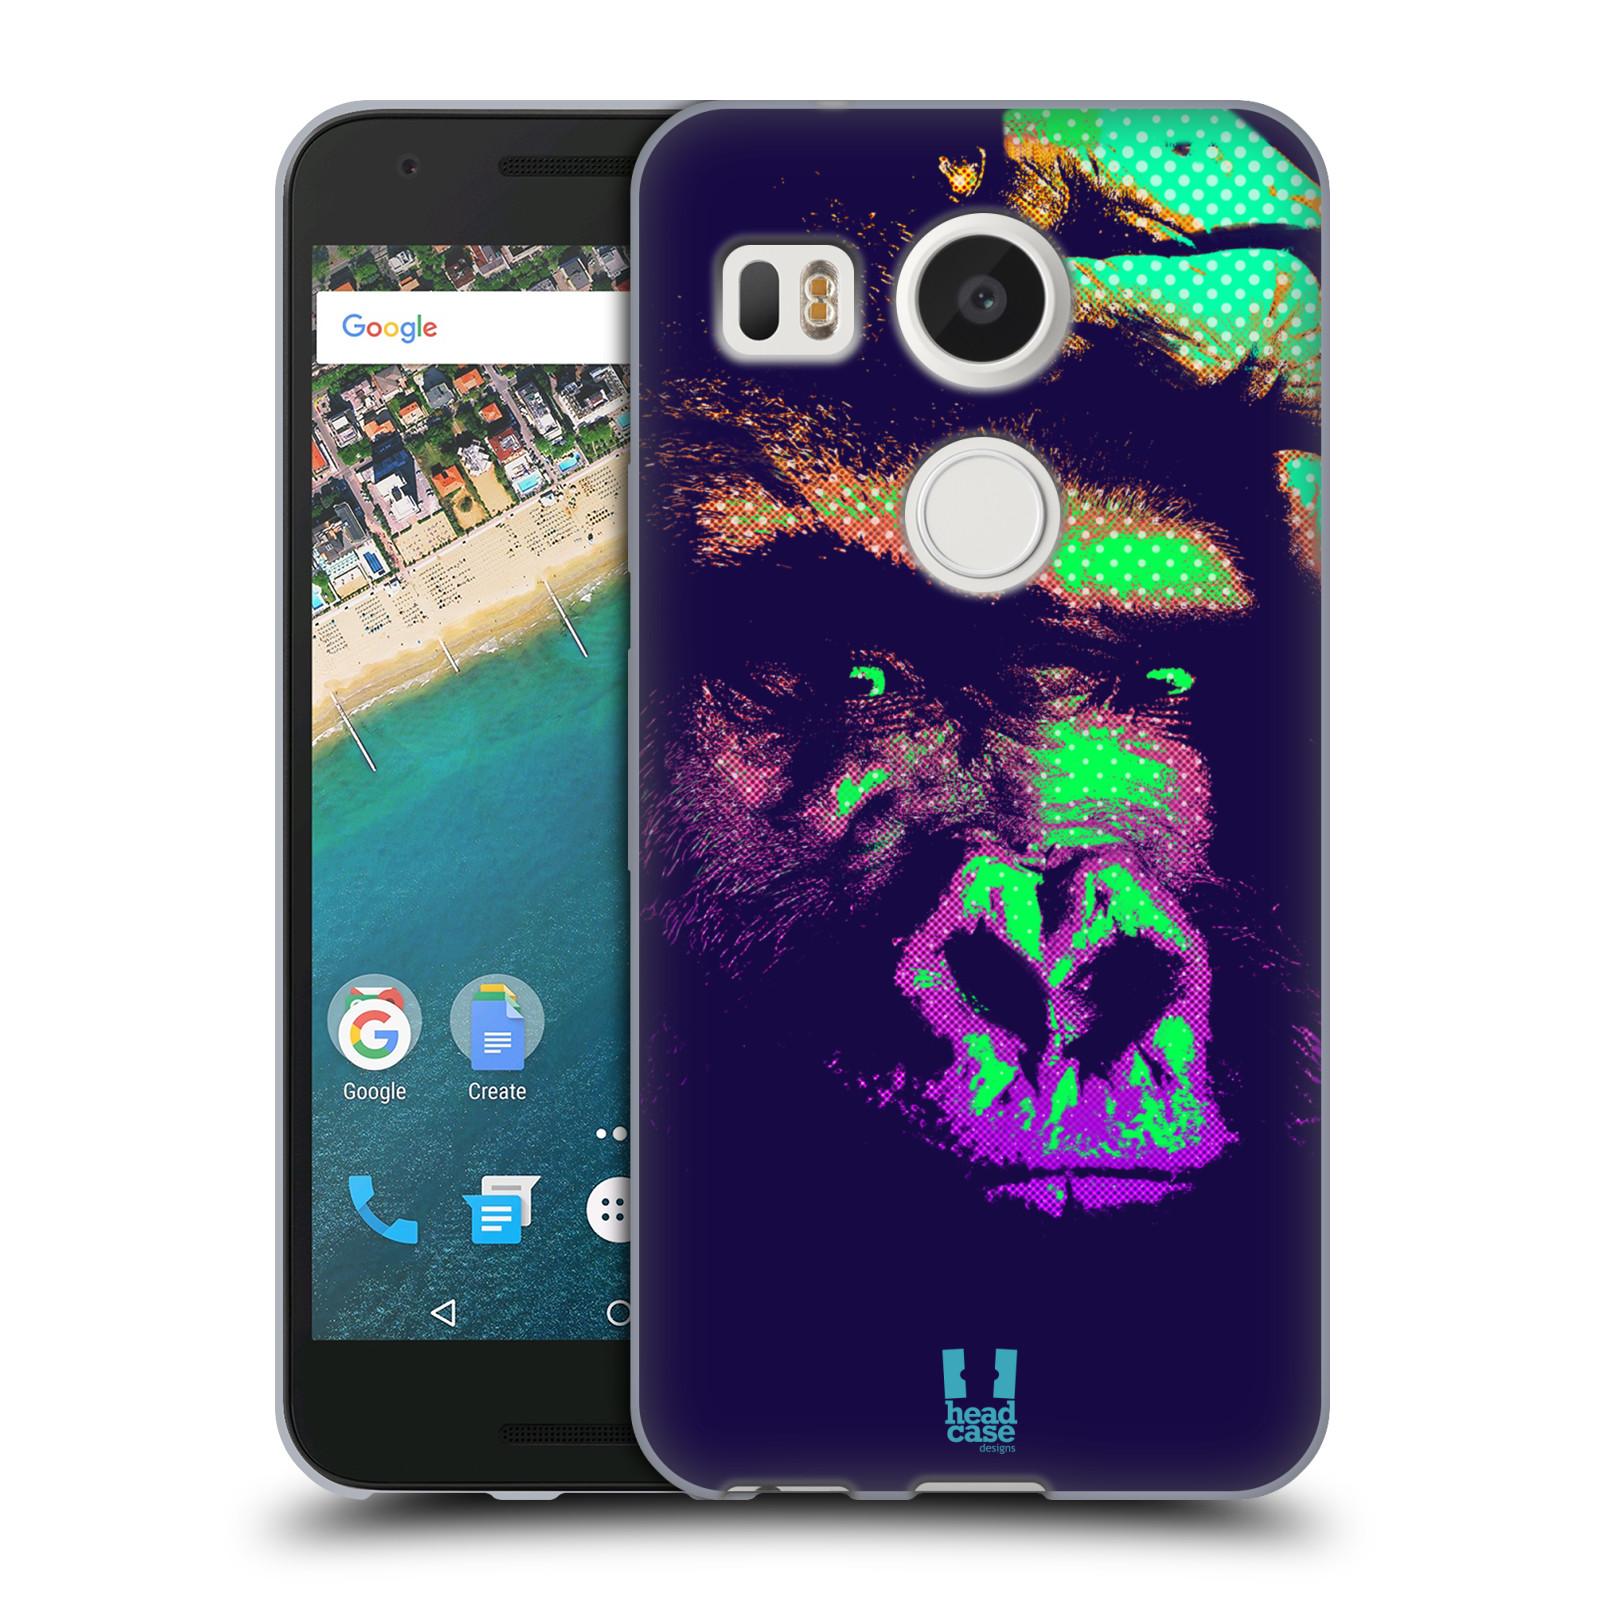 Silikonové pouzdro na mobil LG Nexus 5X - Head Case - POP PRINT GORILA (Silikonový kryt či obal na mobilní telefon LG Nexus 5X)